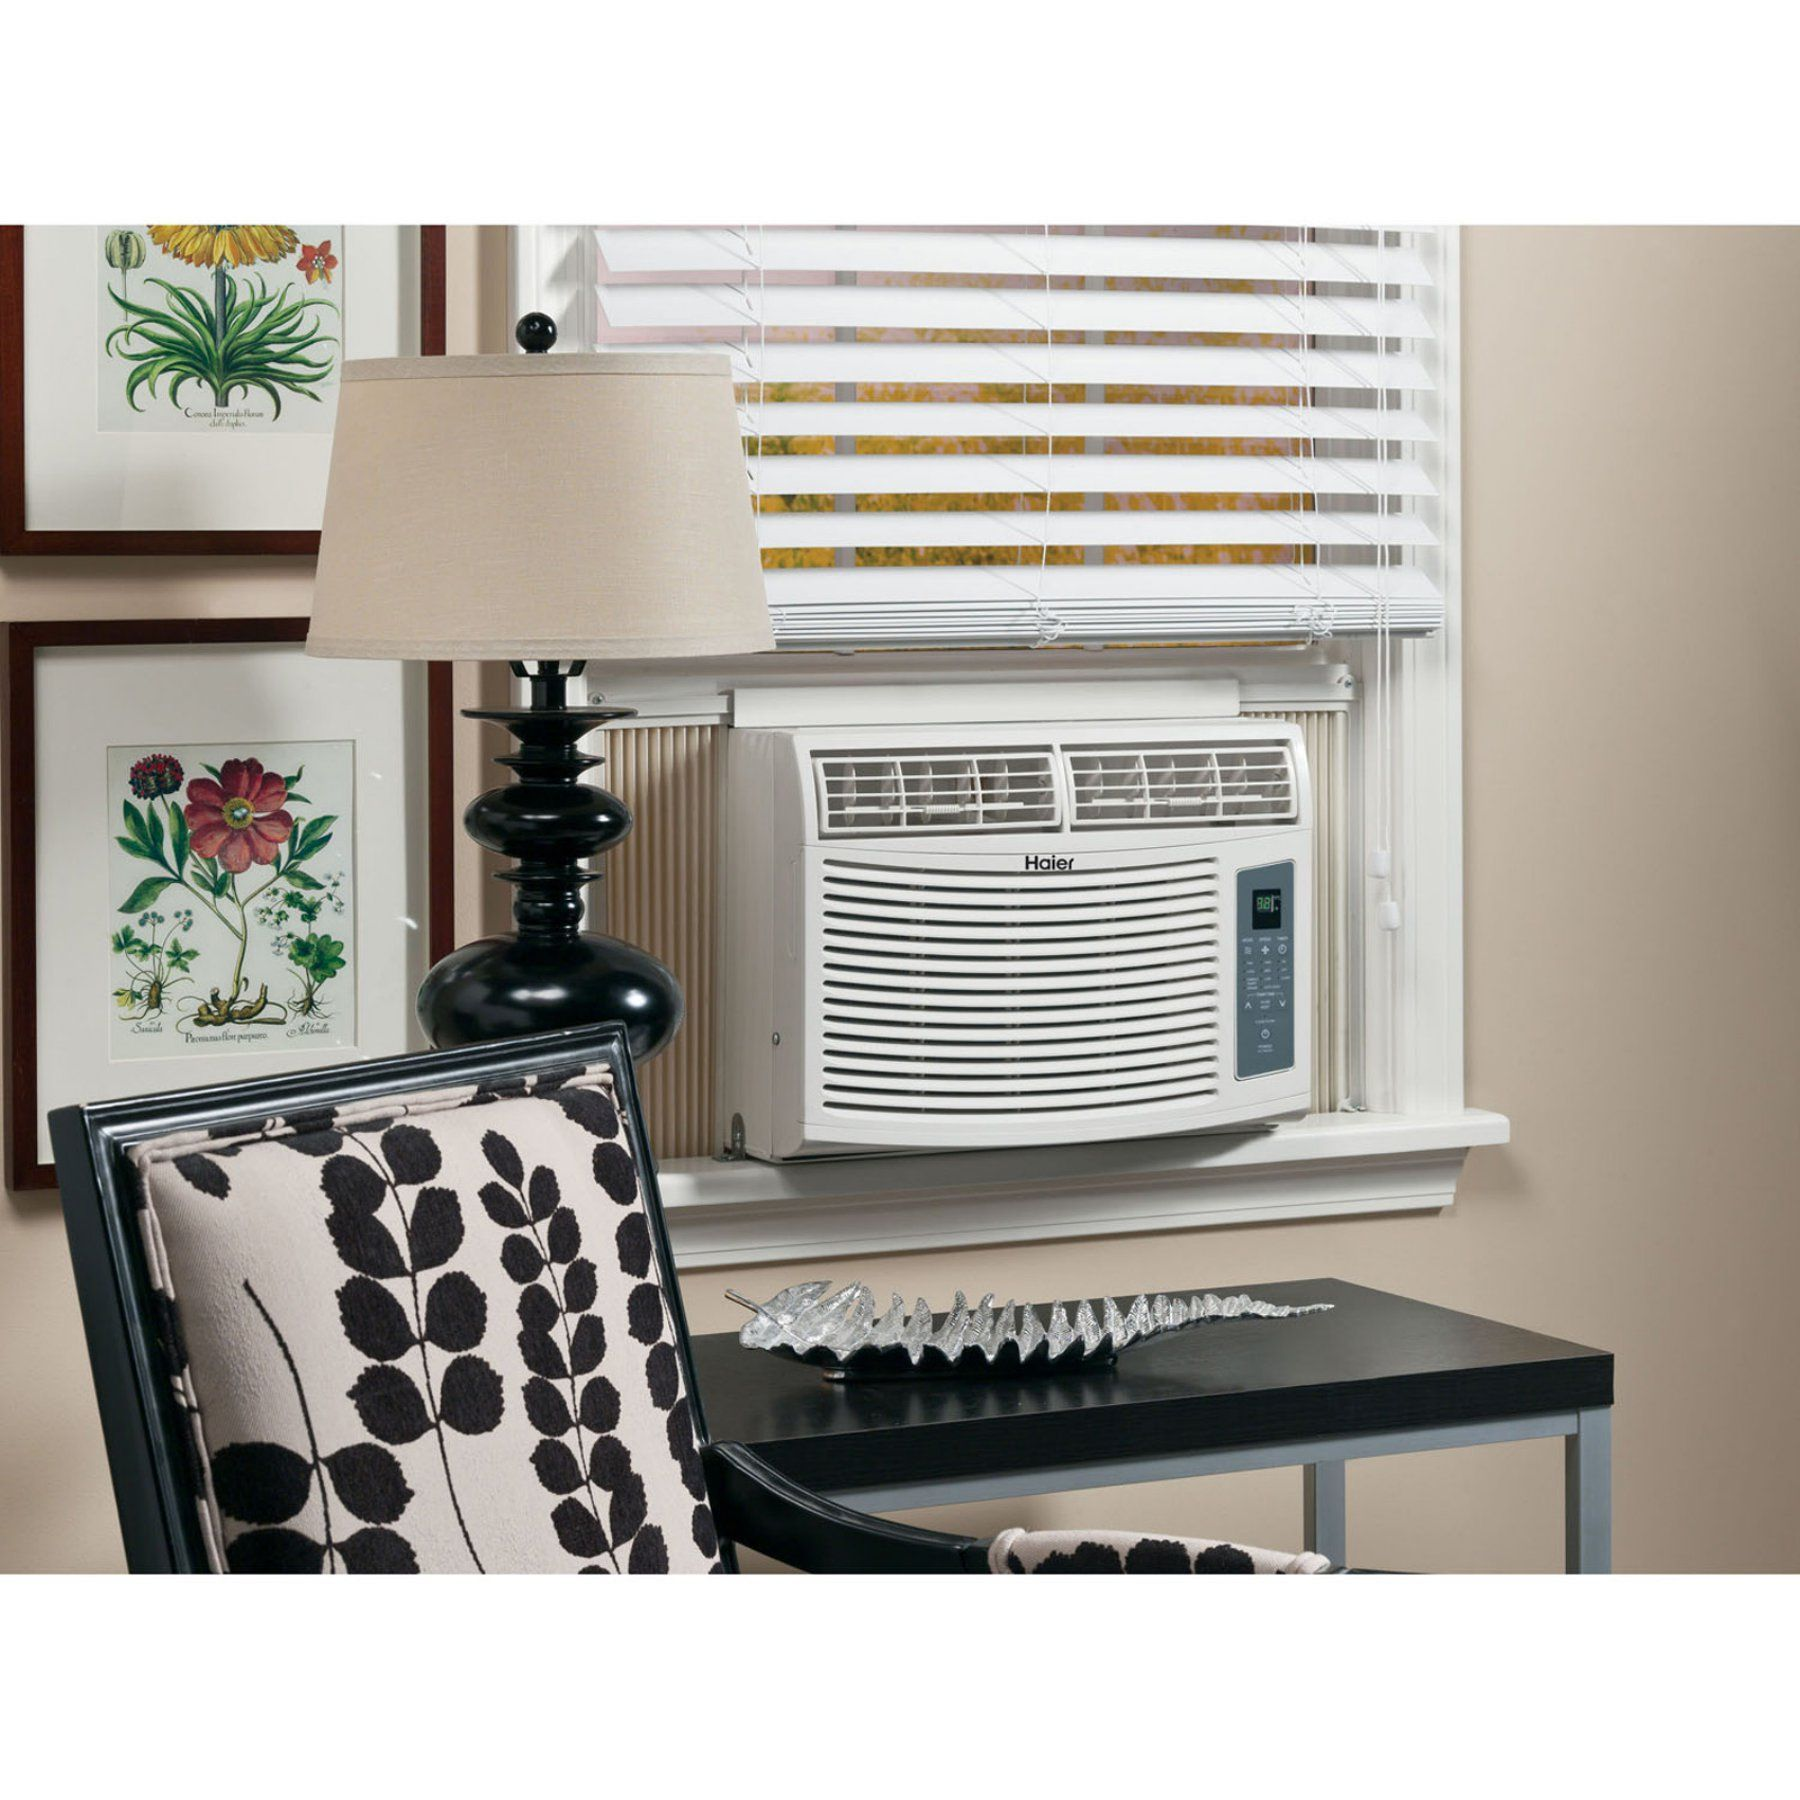 Haier HWE08XCR 8000 BTU WindowMounted Air Conditioner